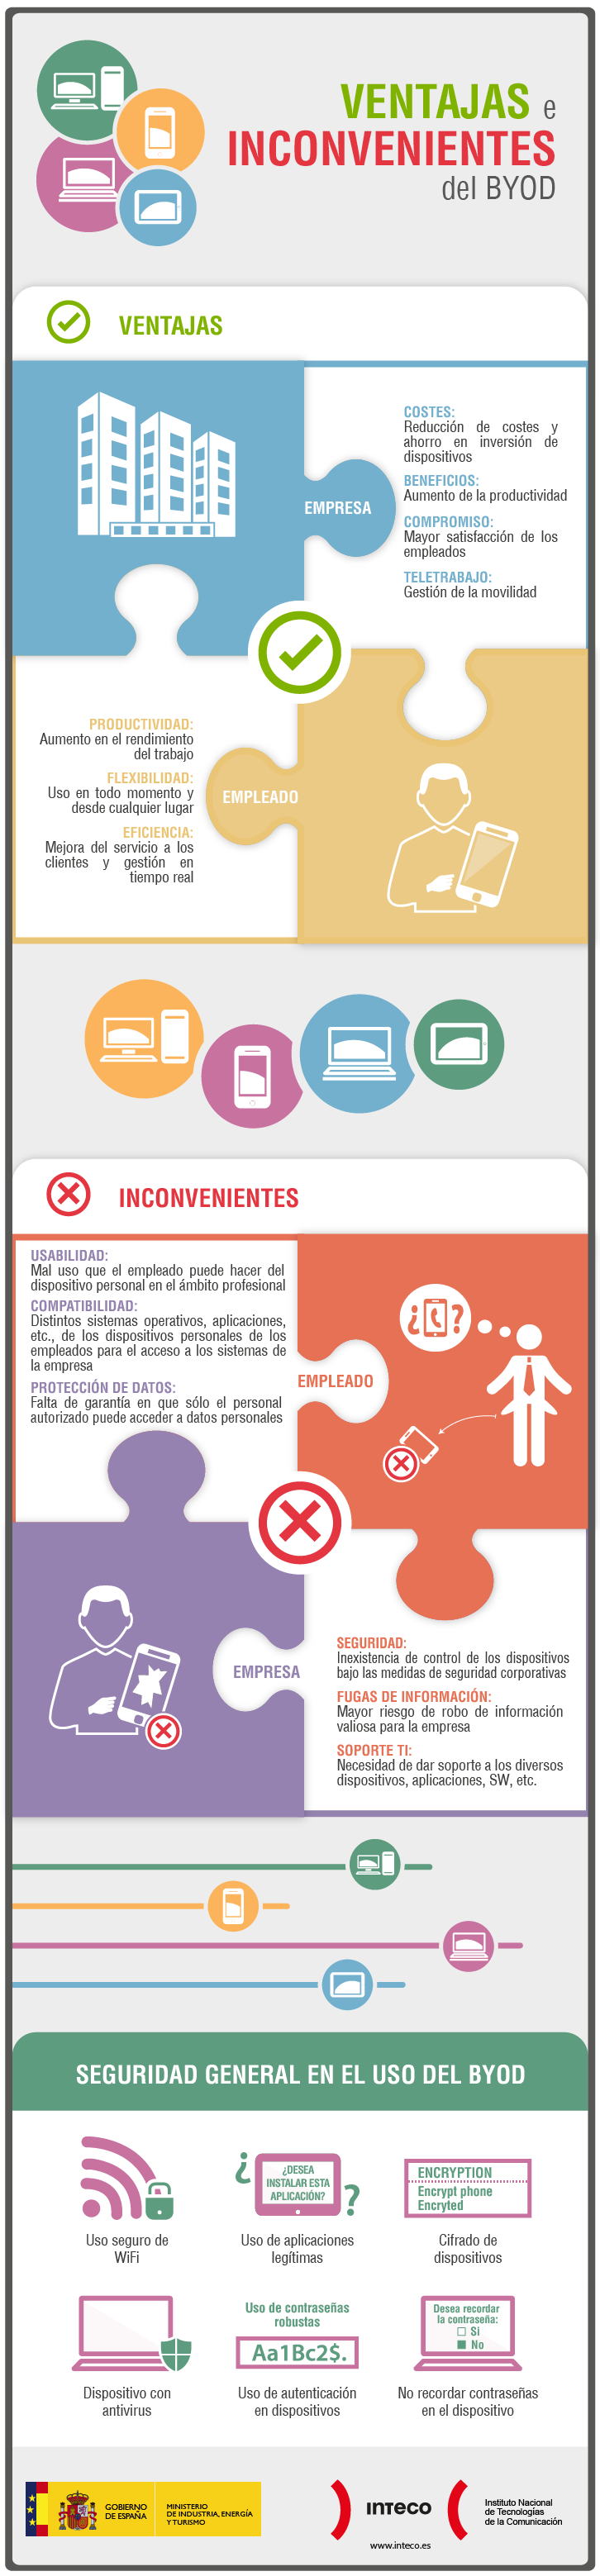 Ventajas e inconvenientes del BYOD